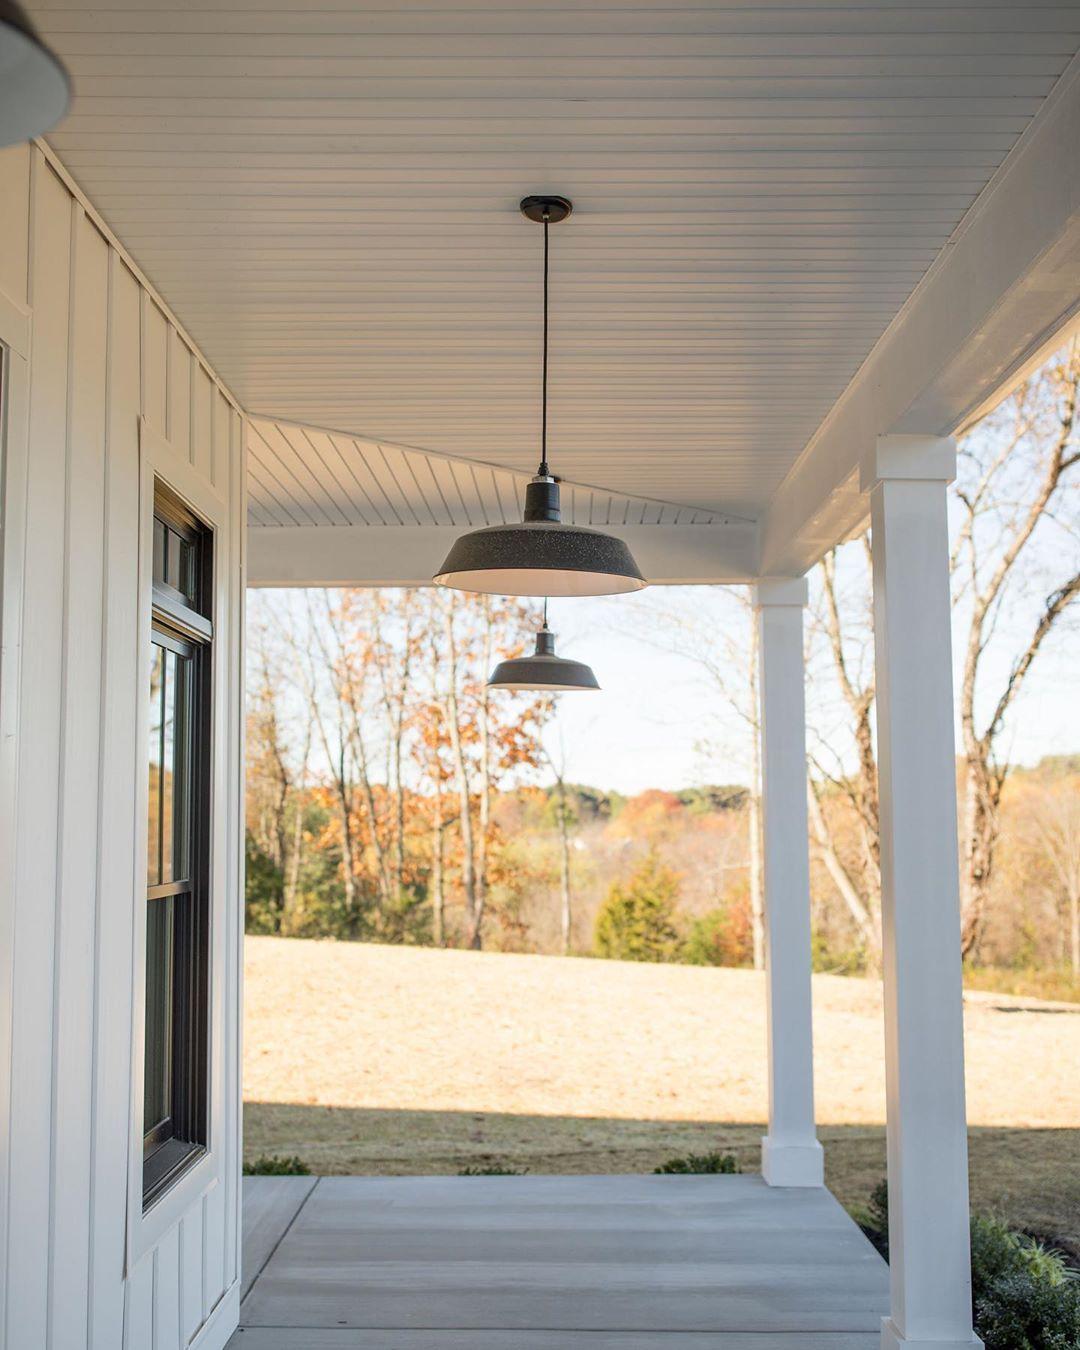 Barn Light Electric On Instagram A Wrap Around Farmhouse Porch